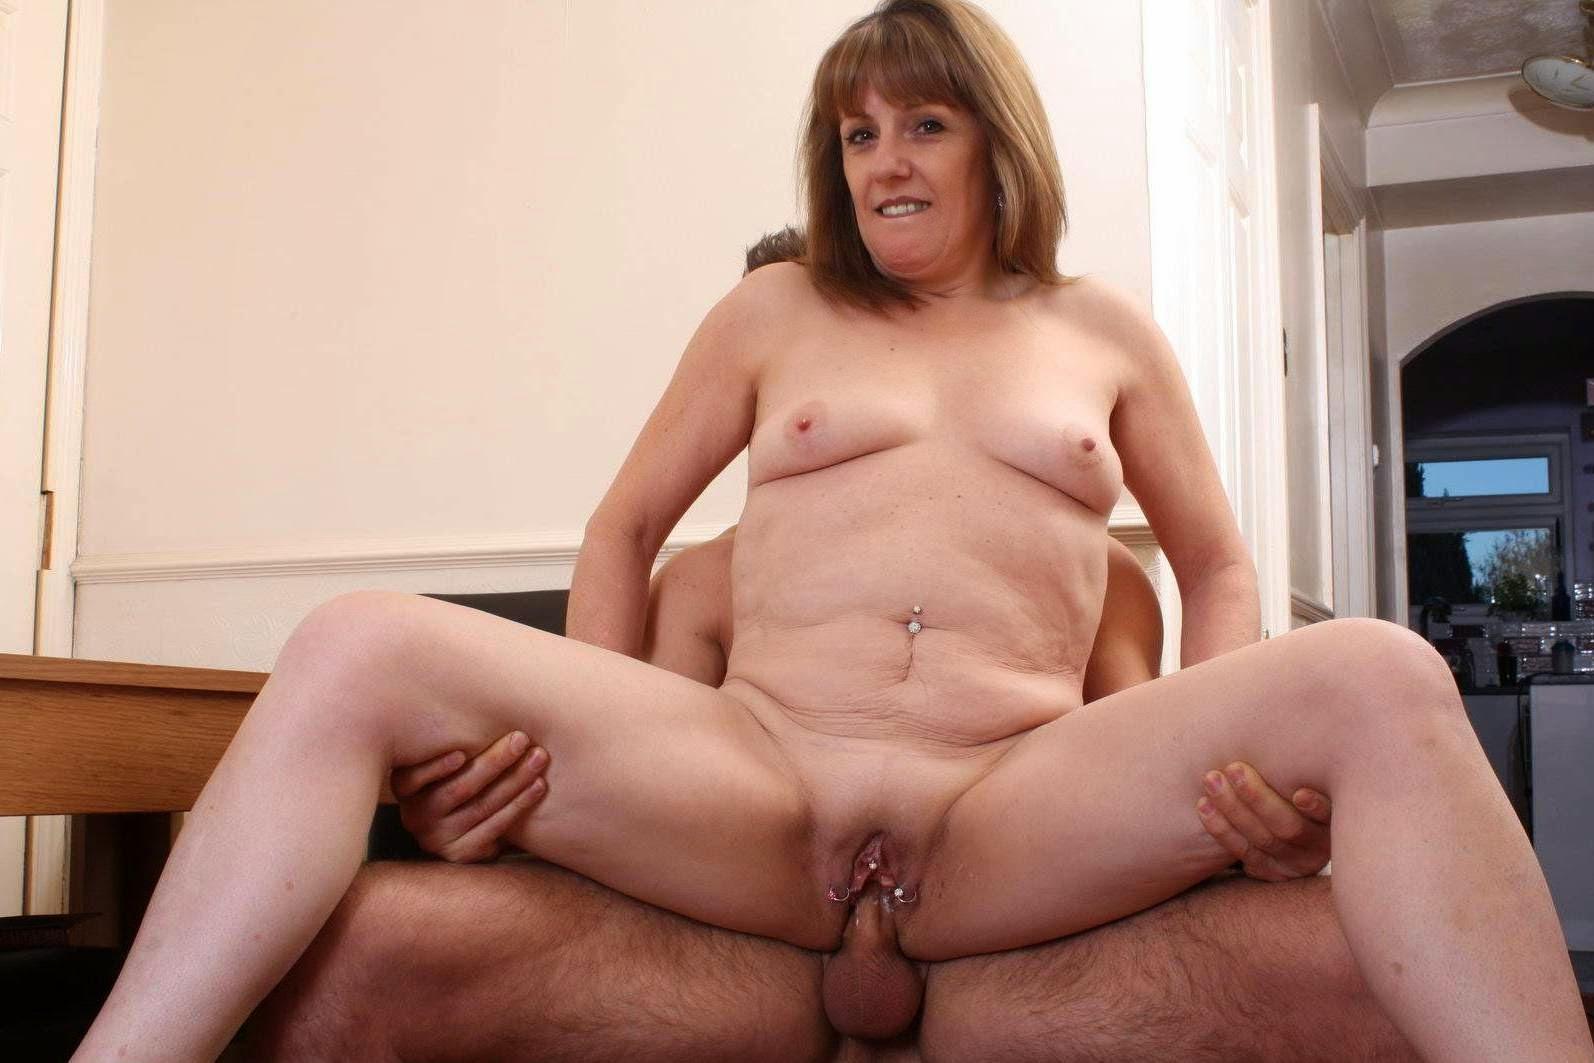 mom opening